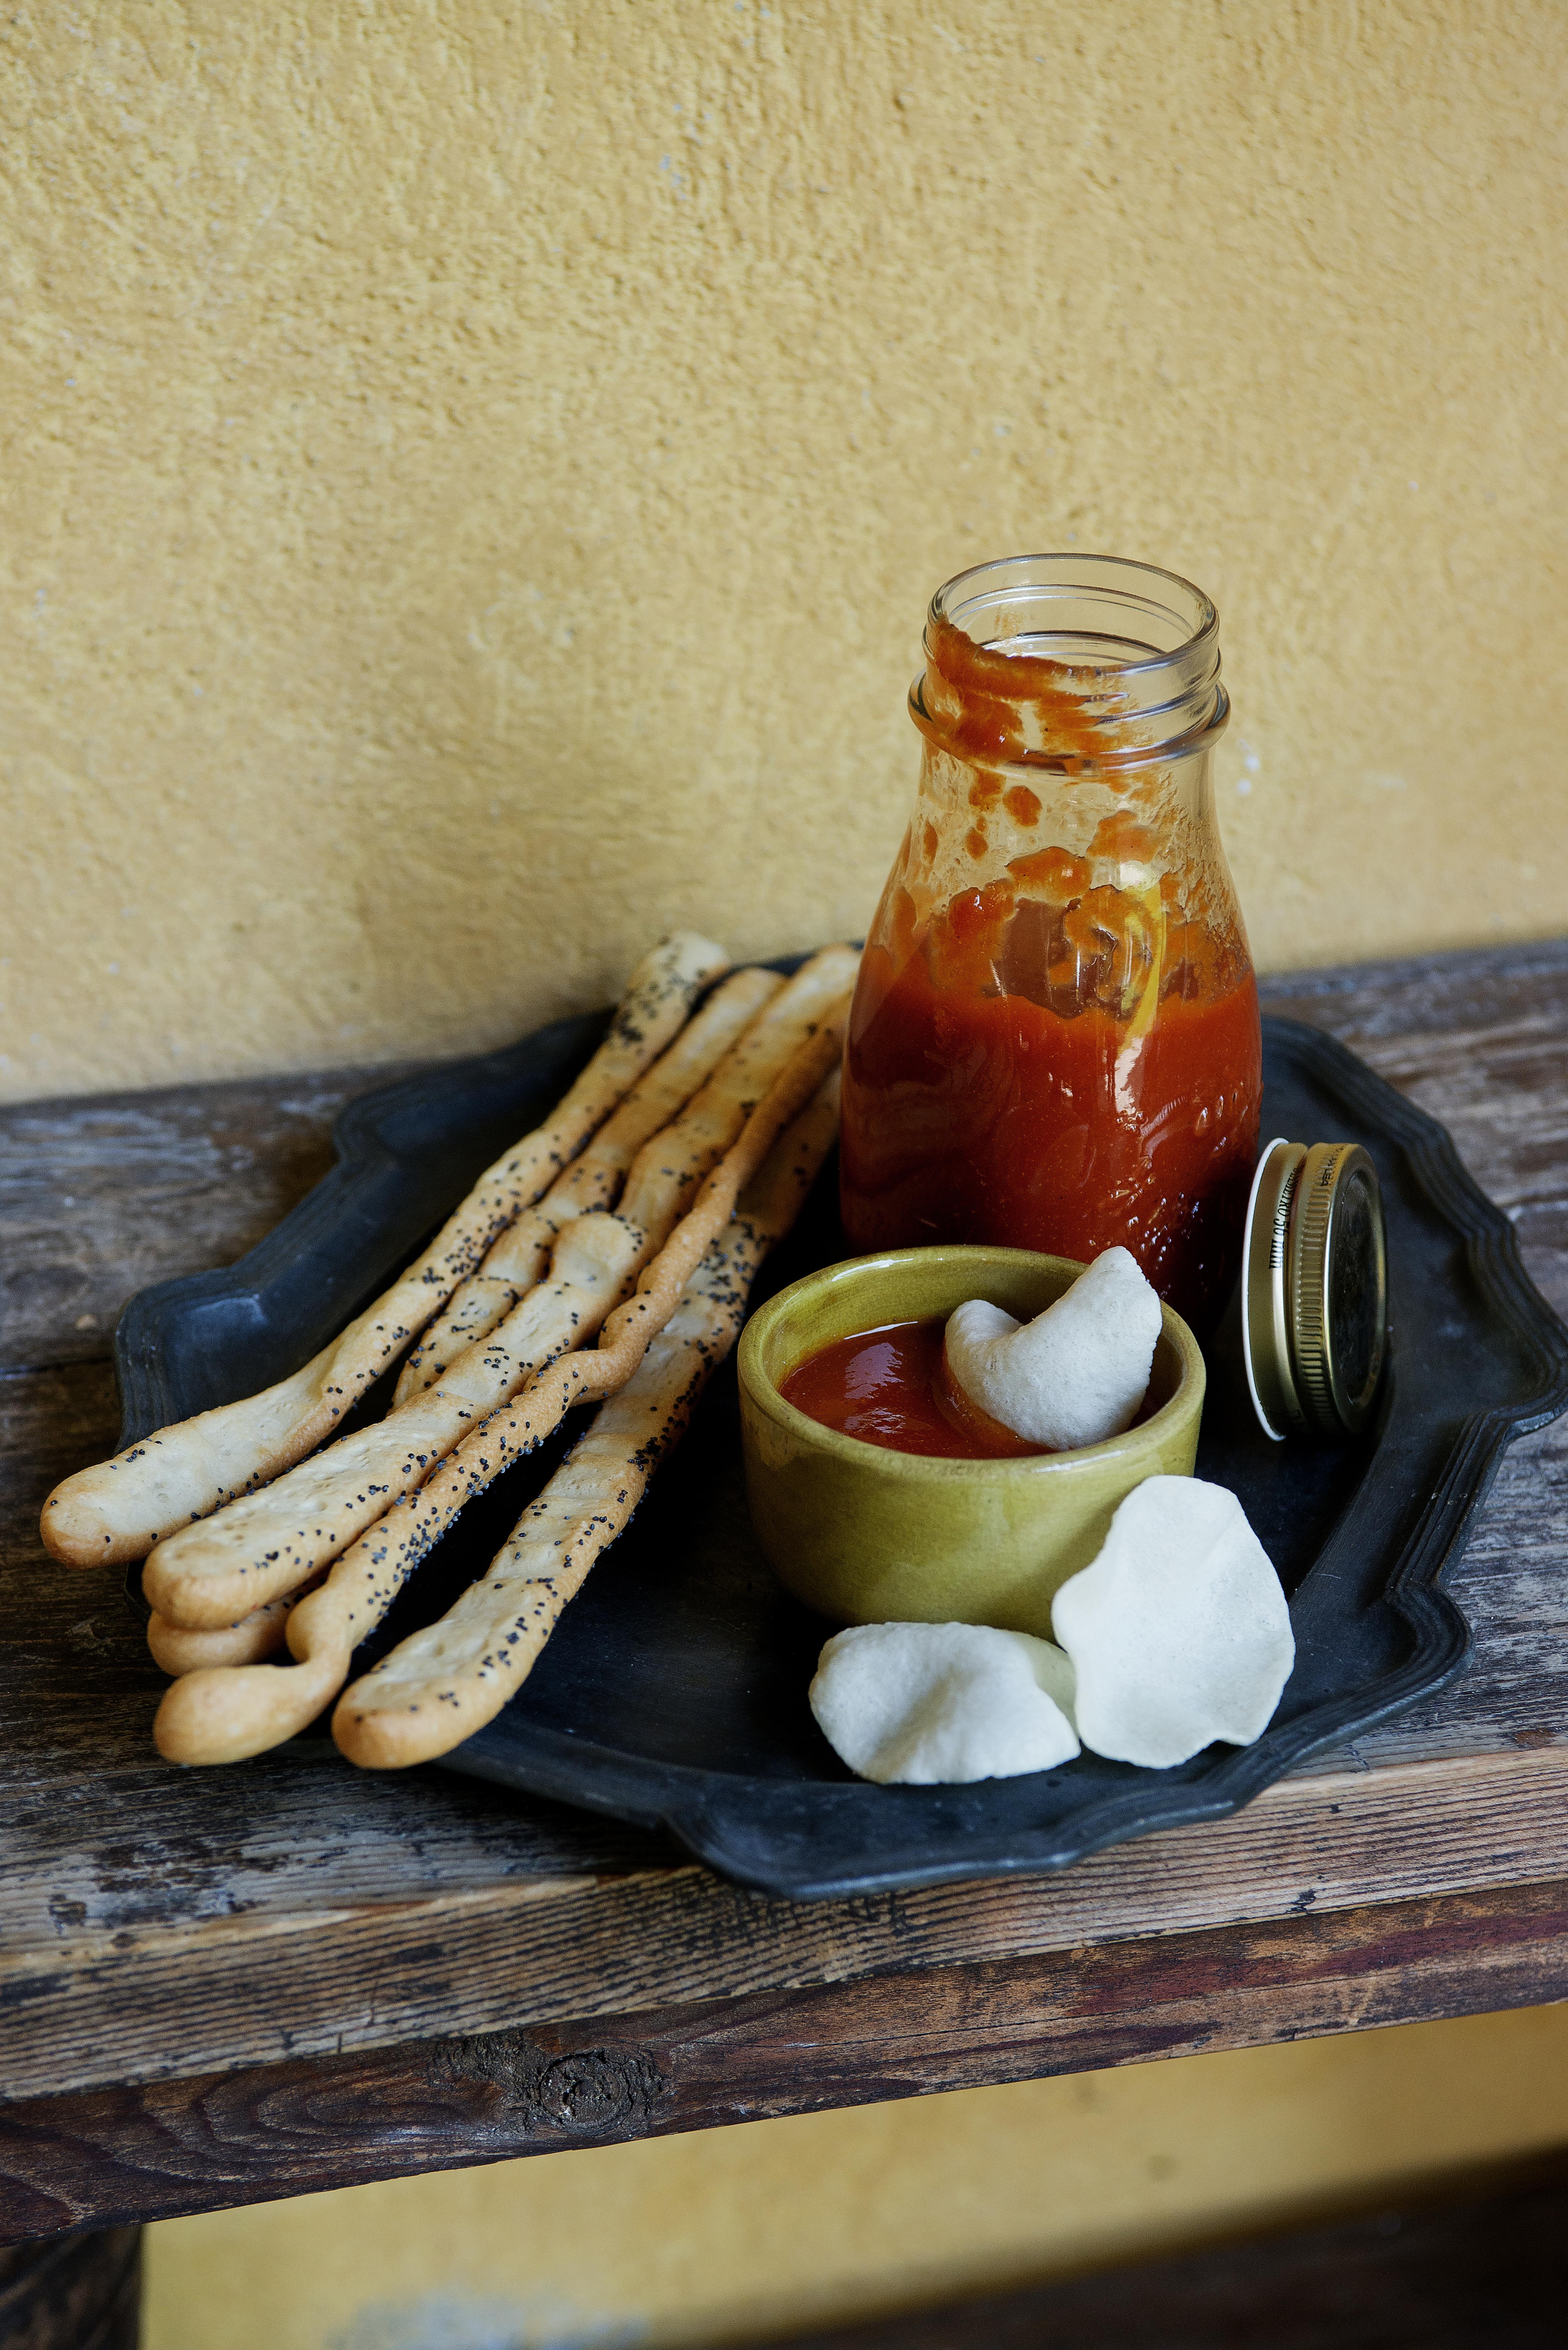 COME FARE IL KETCHUP IN CASA | ricetta ketchup | salsa ketchup